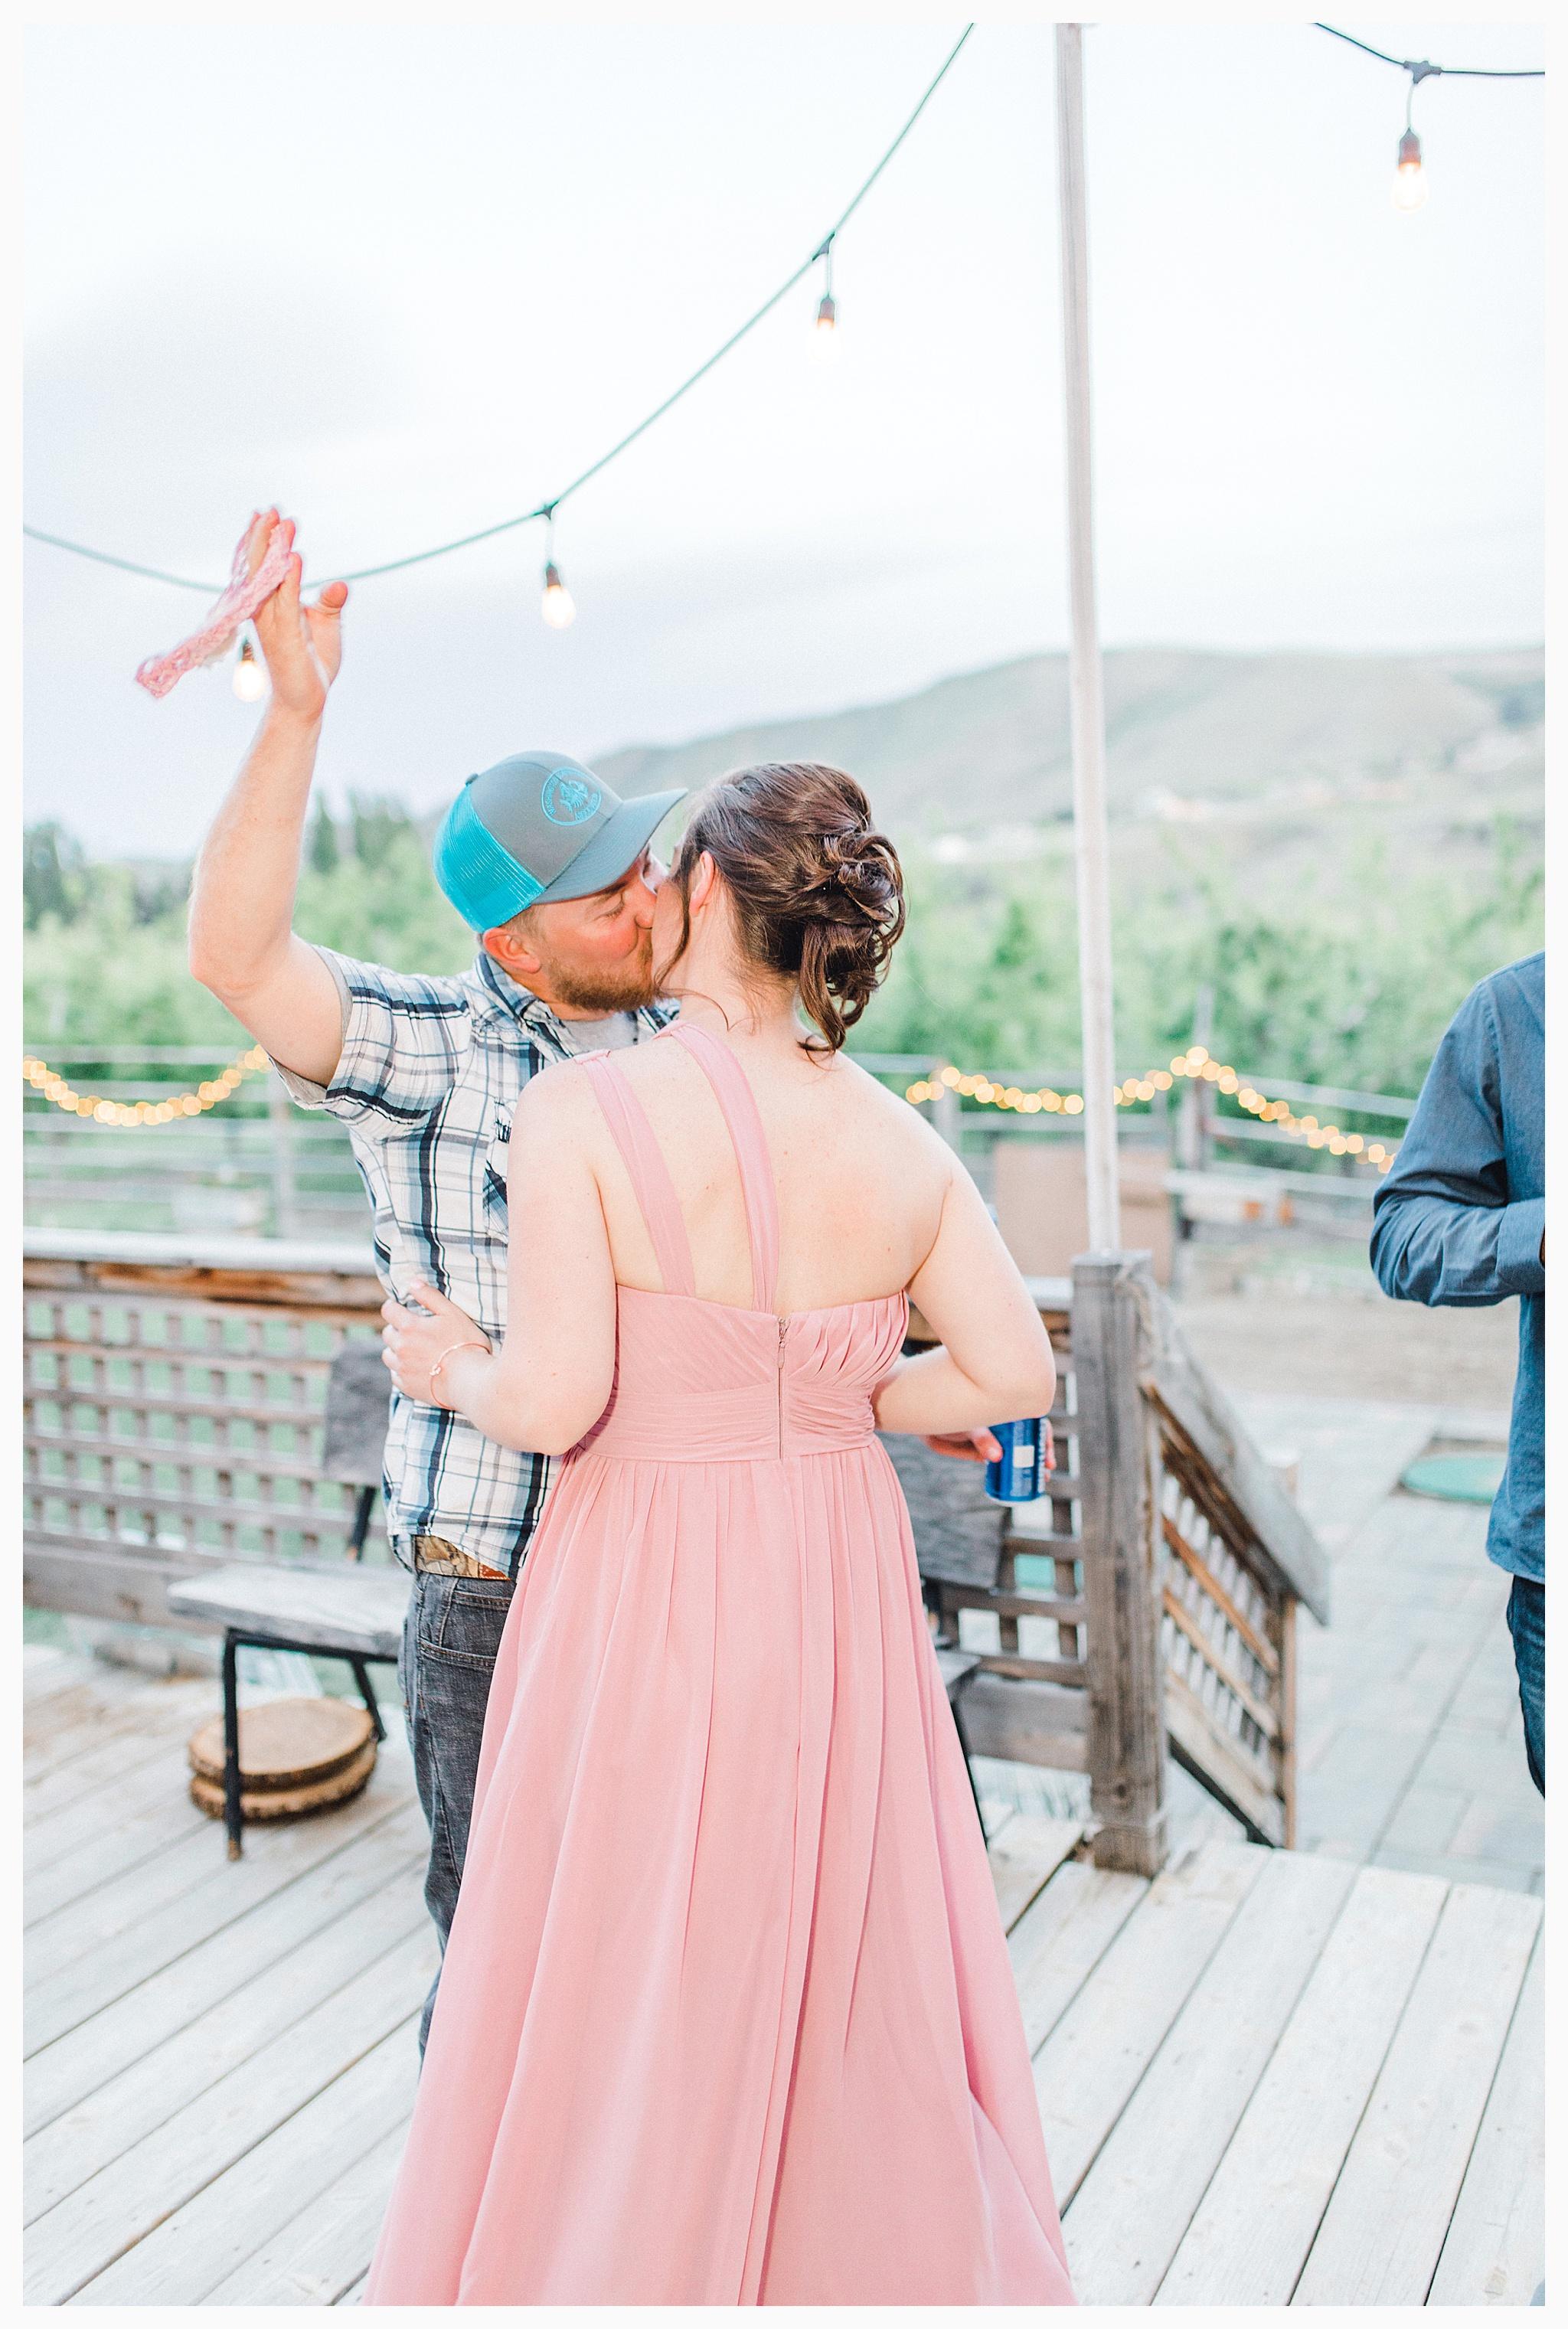 Rustic barn wedding in Wenatchee Washington at Sunshine Ranch on Easy Street, Emma Rose Company Seattle PNW Light and Airy Wedding Photographer_0117.jpg